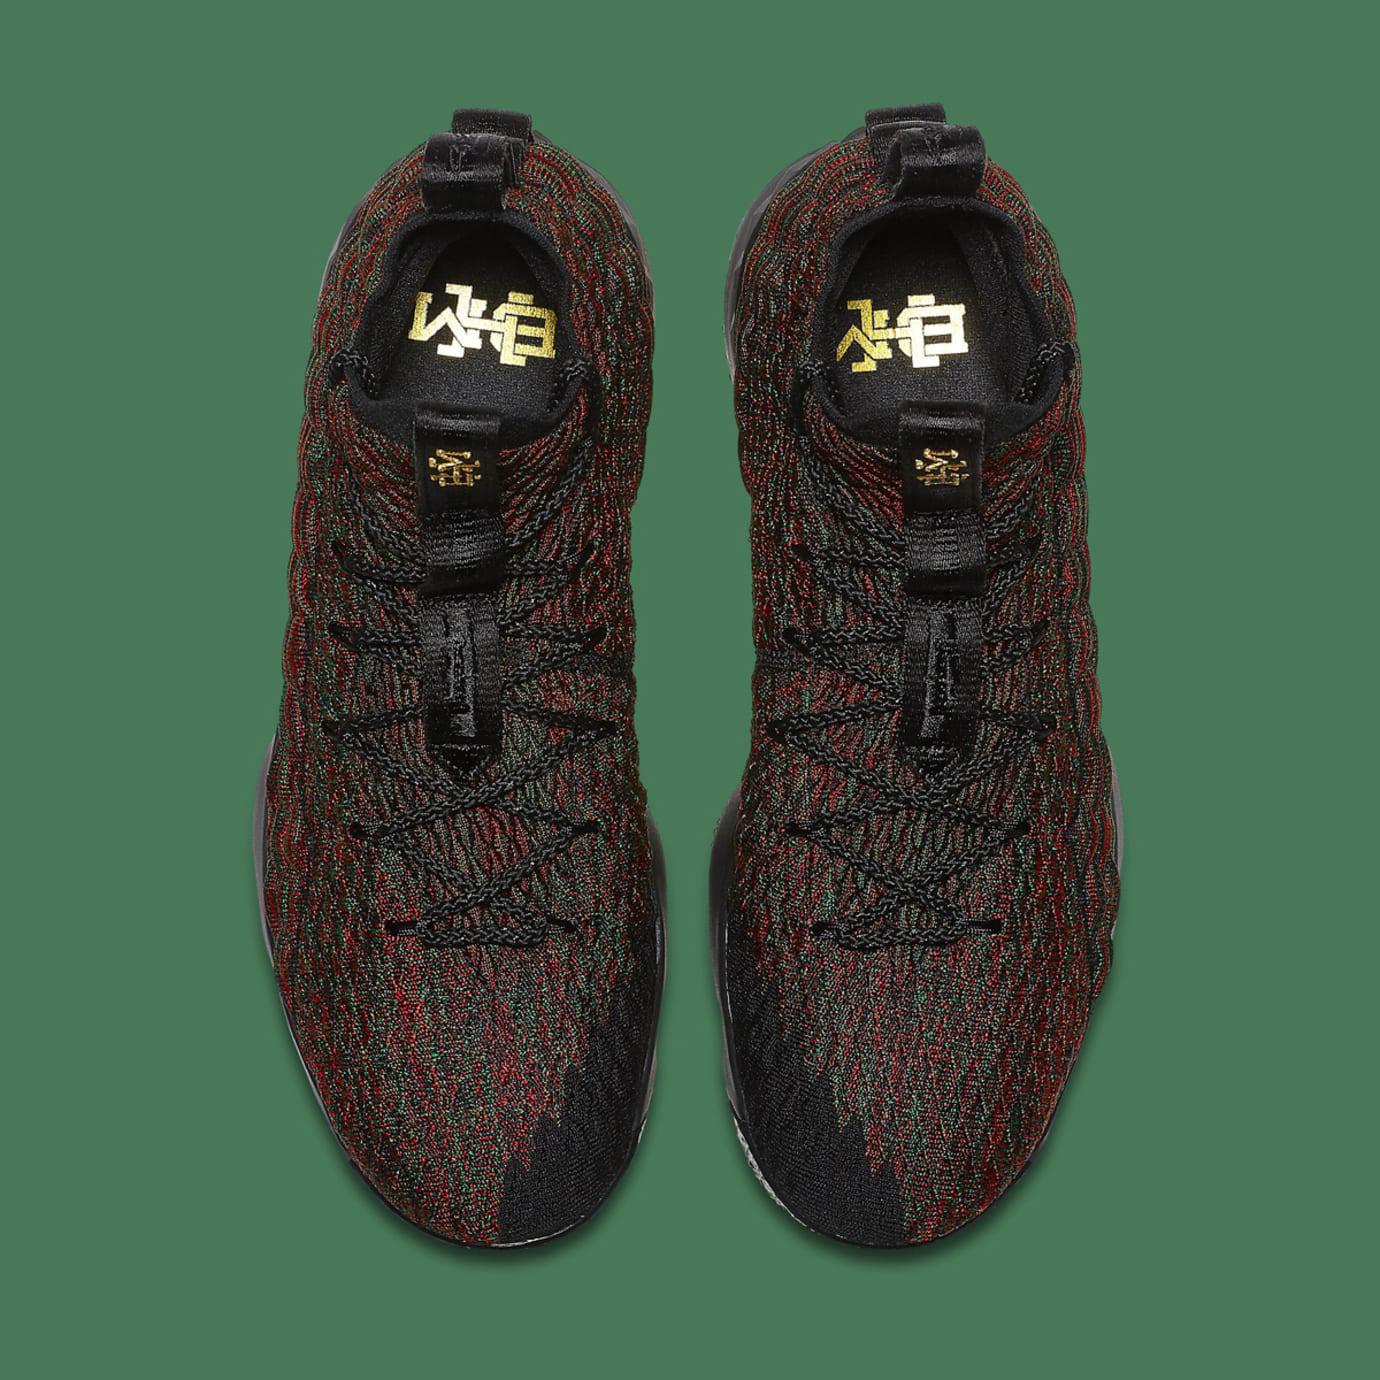 2aa9507b3226 Nike LeBron KD Kyrie Black History Month Sneakers 2018